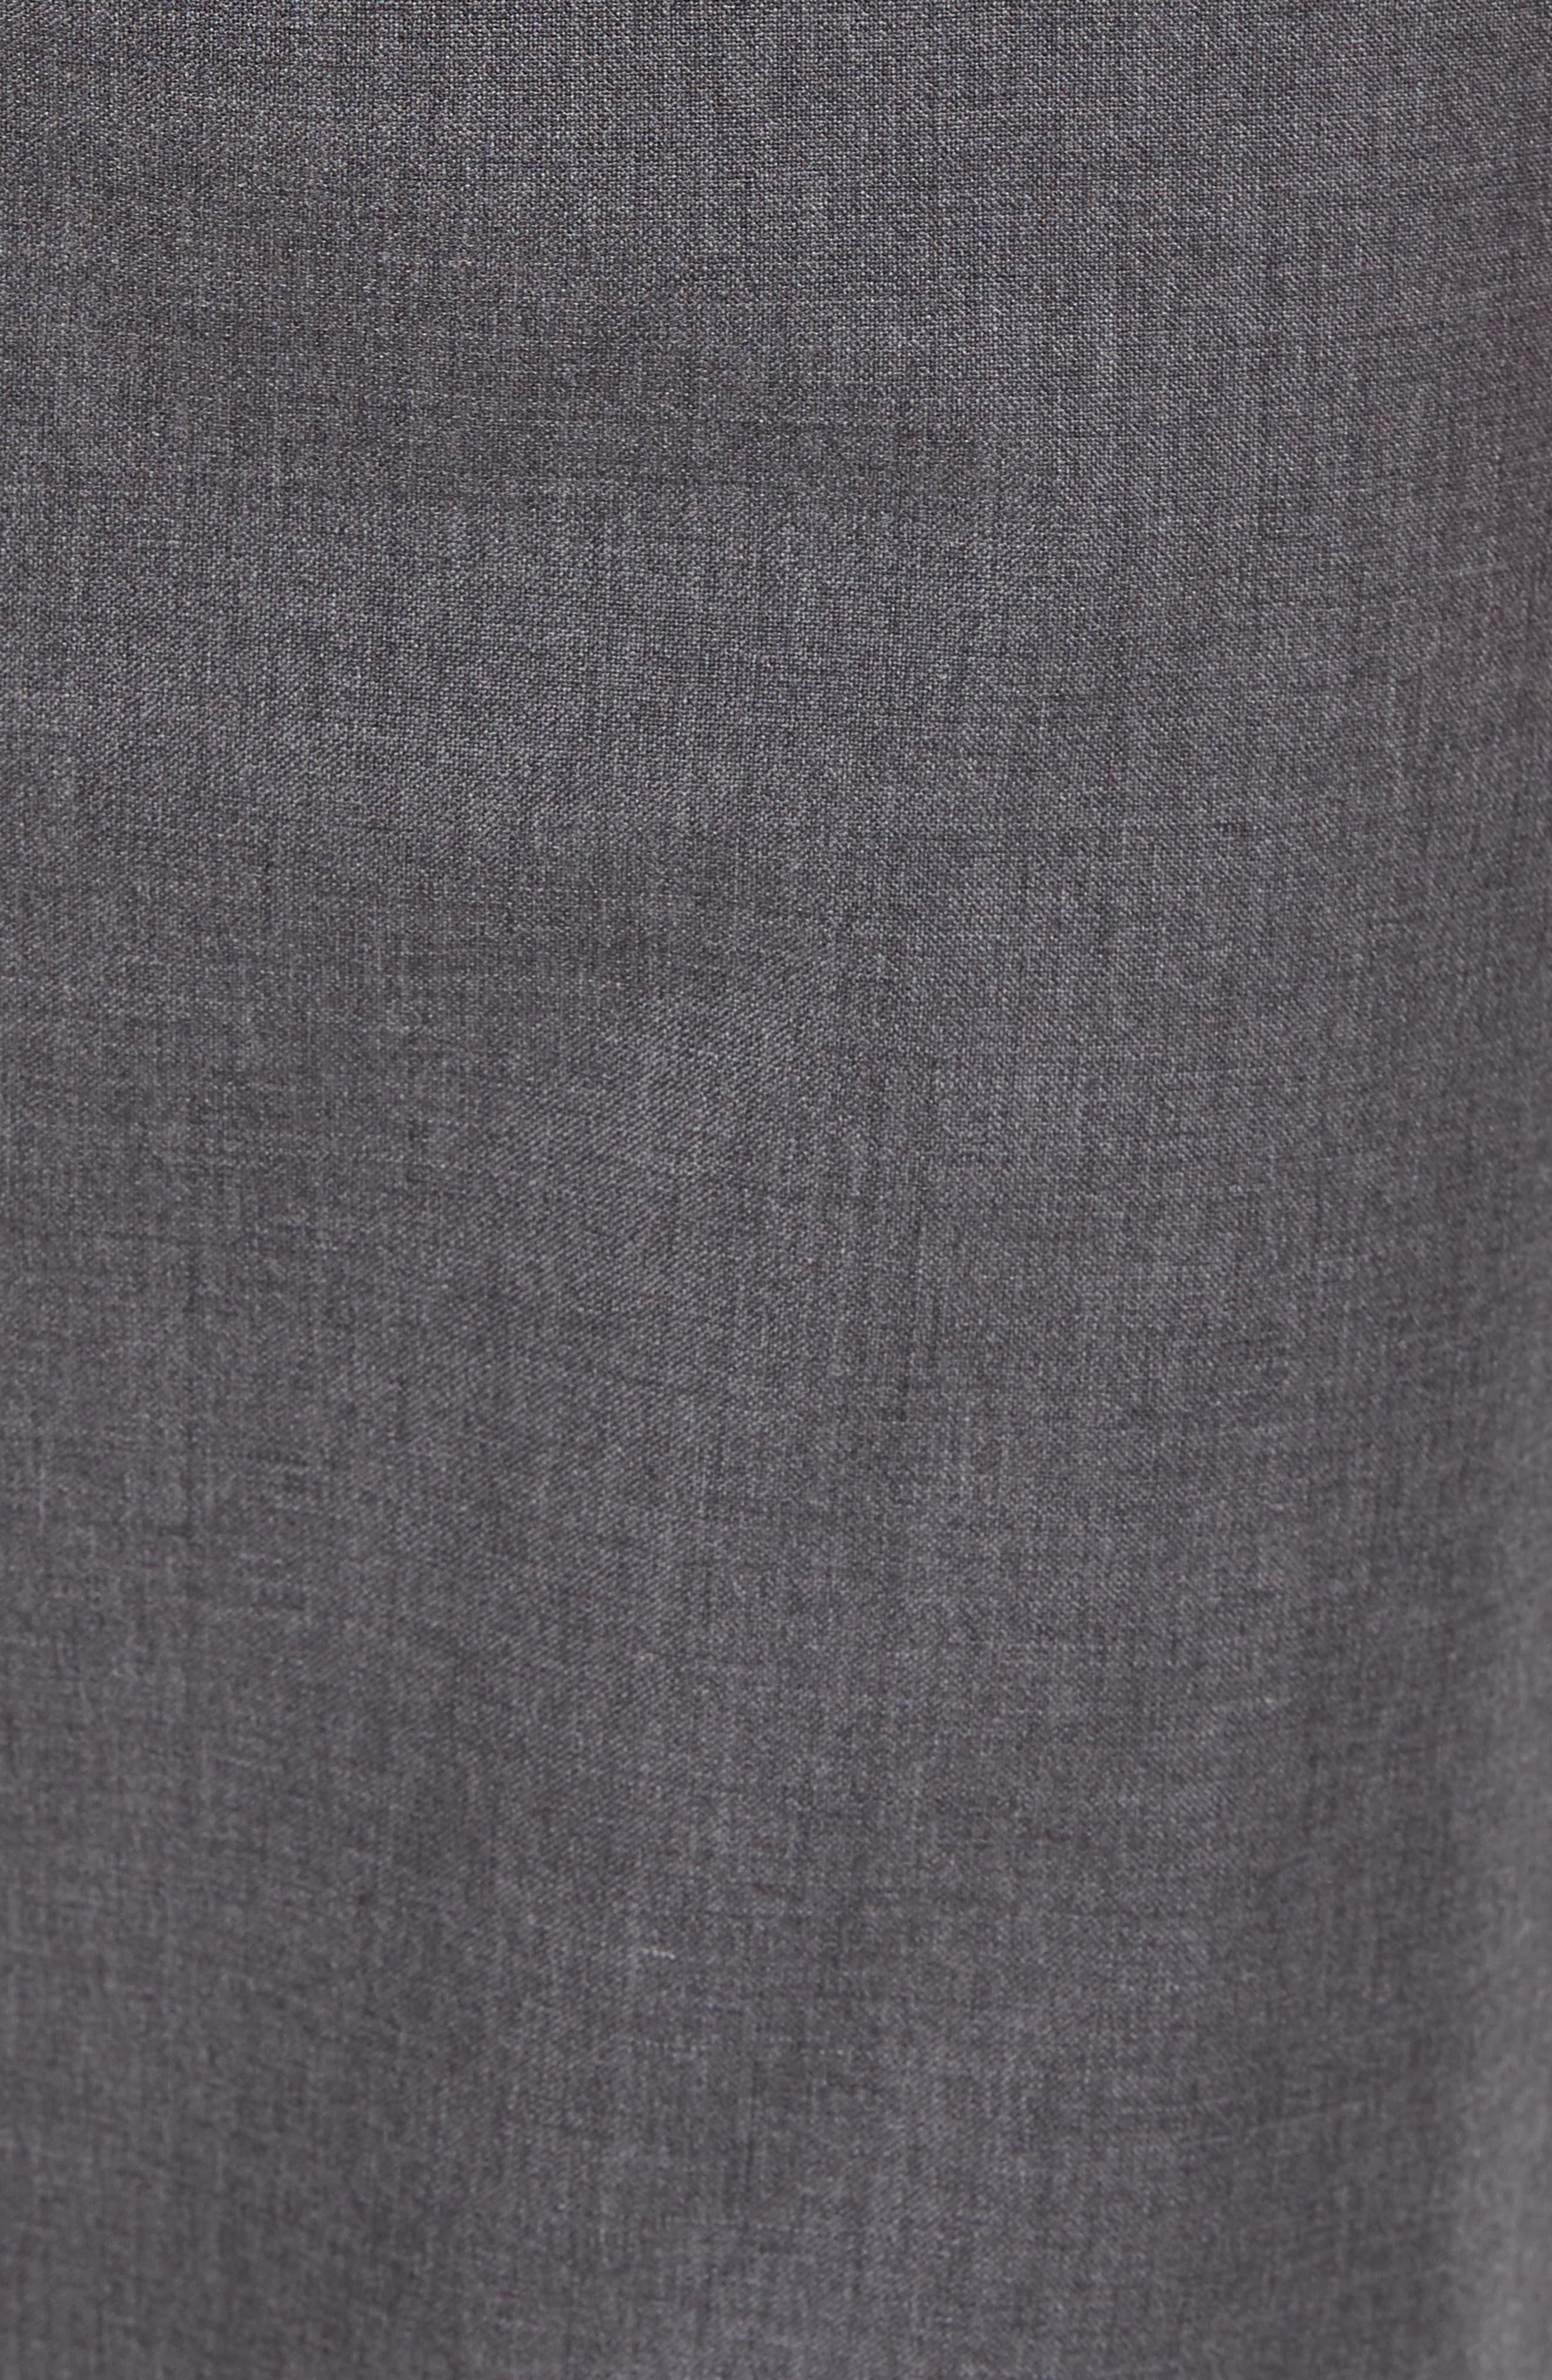 Slim Fit Wool Track Pants,                             Alternate thumbnail 5, color,                             Light Heather Grey